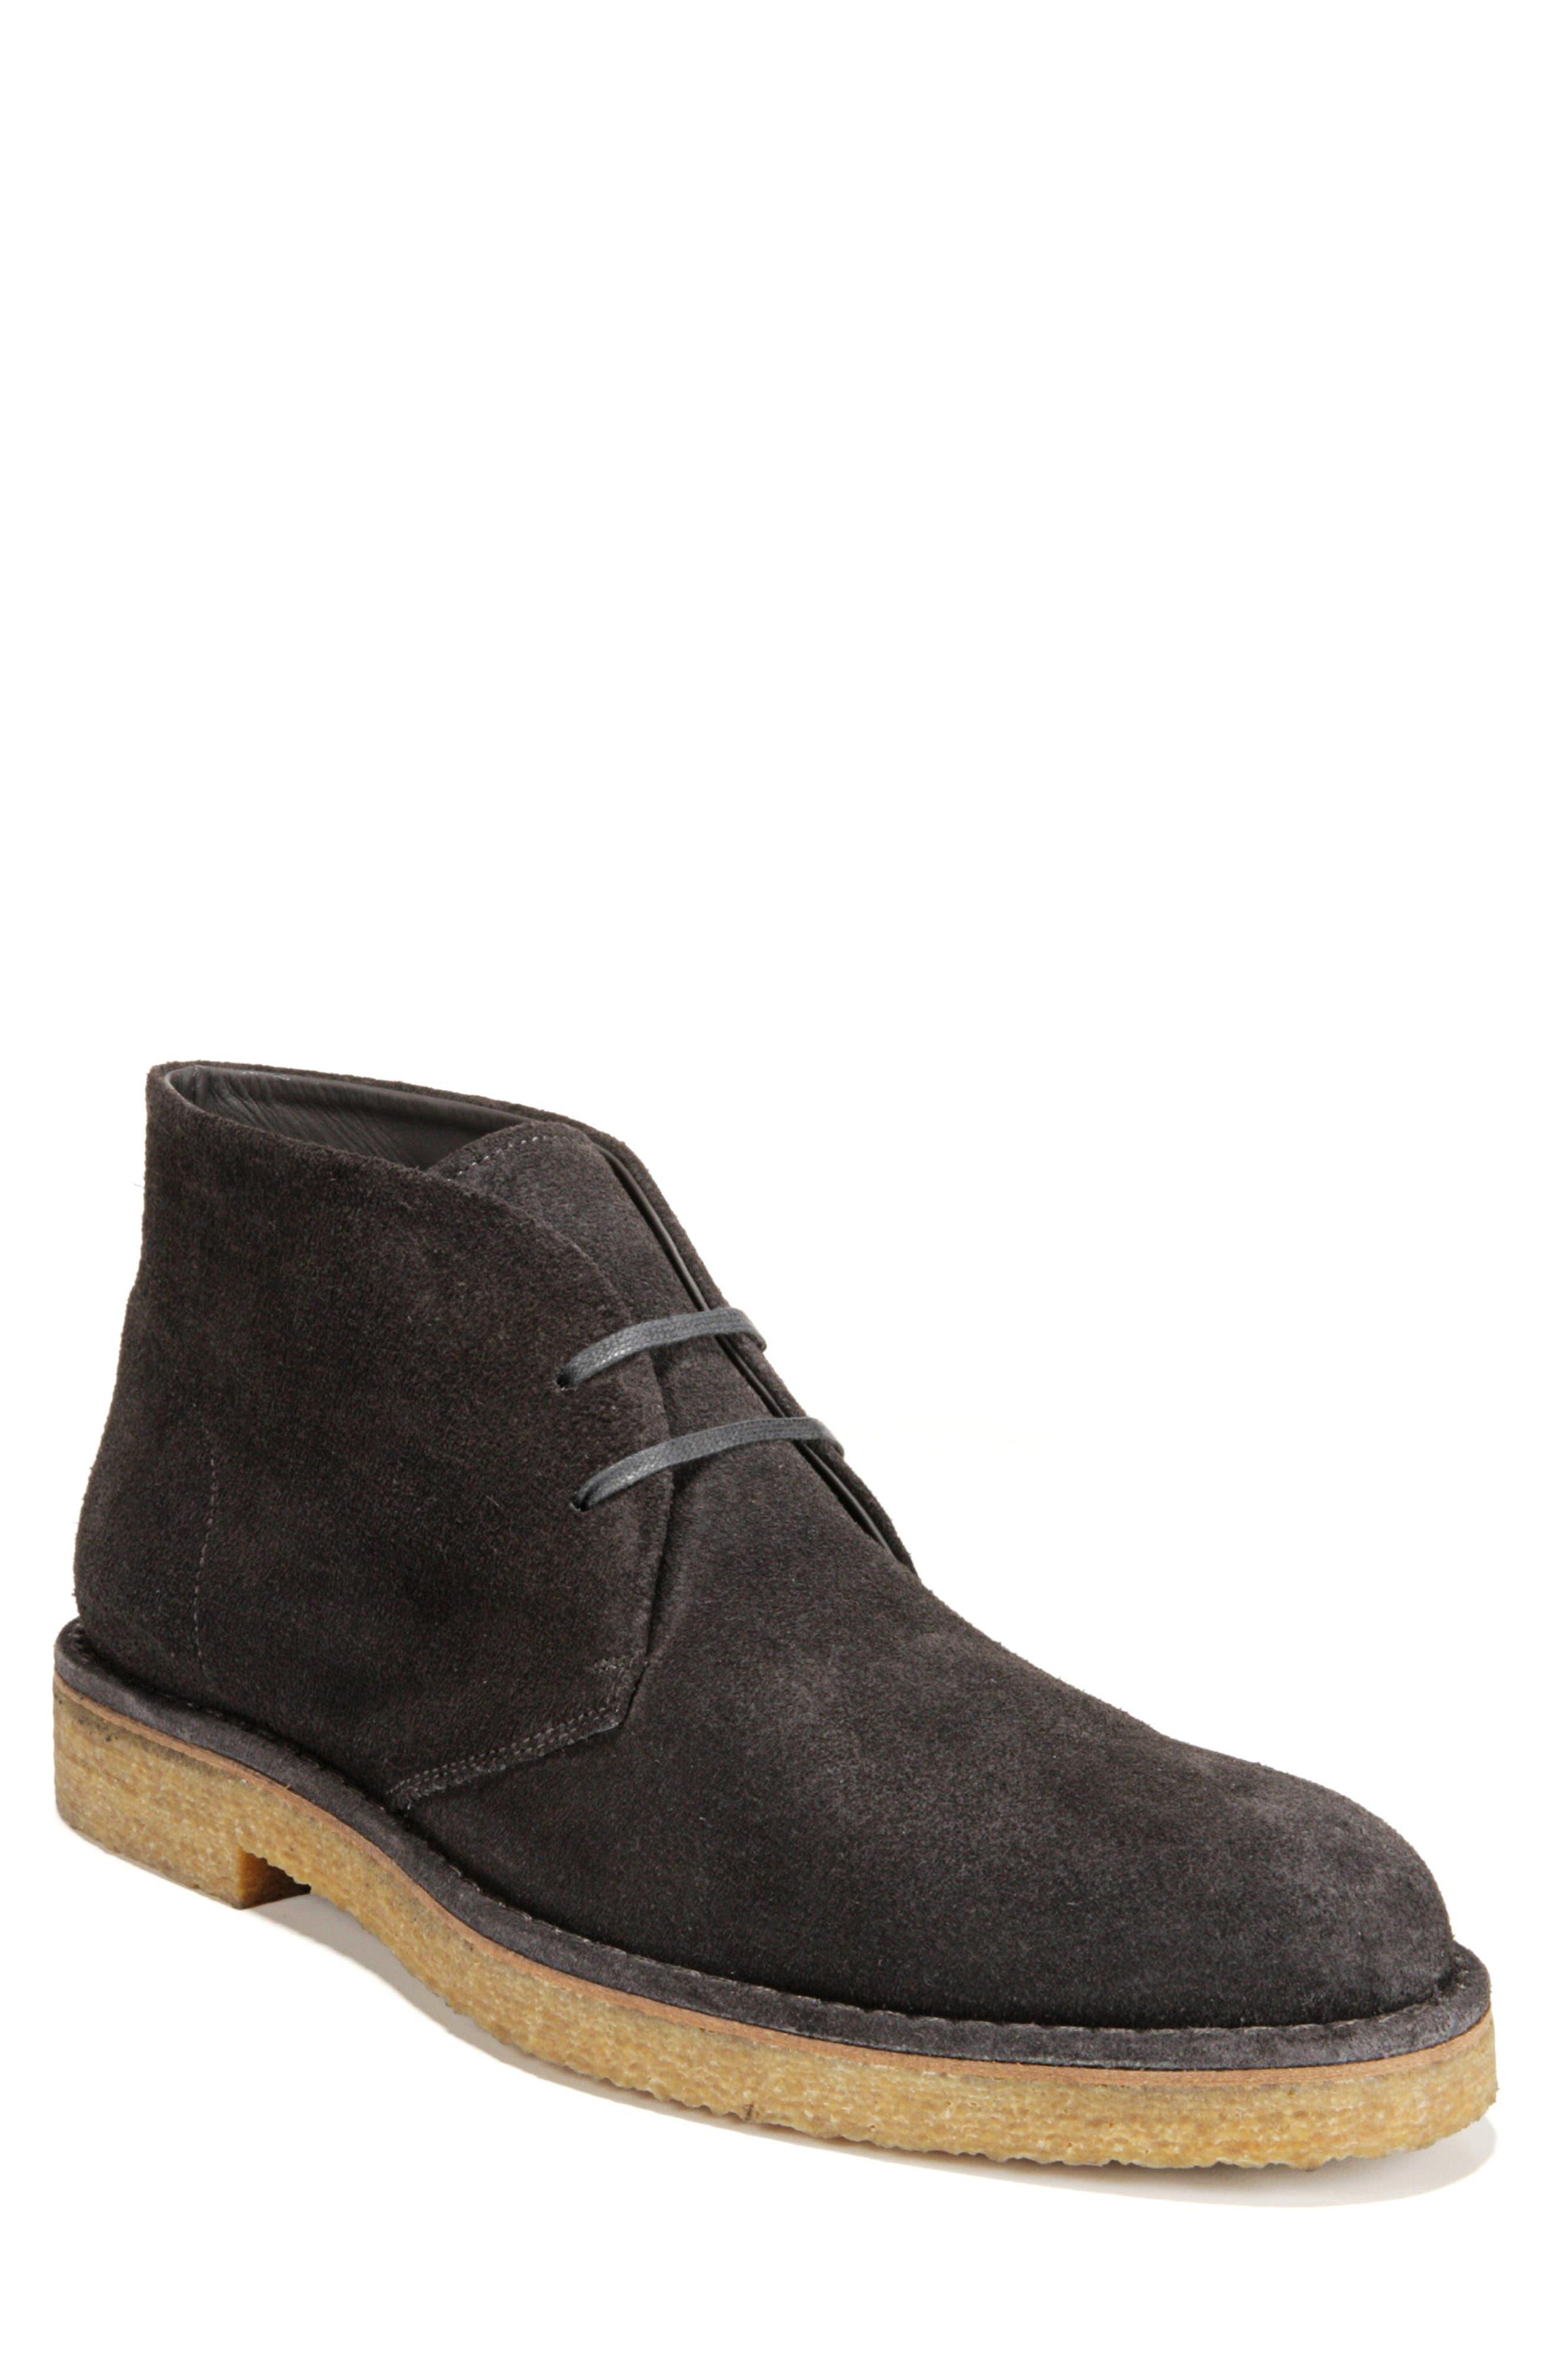 Crofton Chukka Boot,                         Main,                         color, GRAPHITE